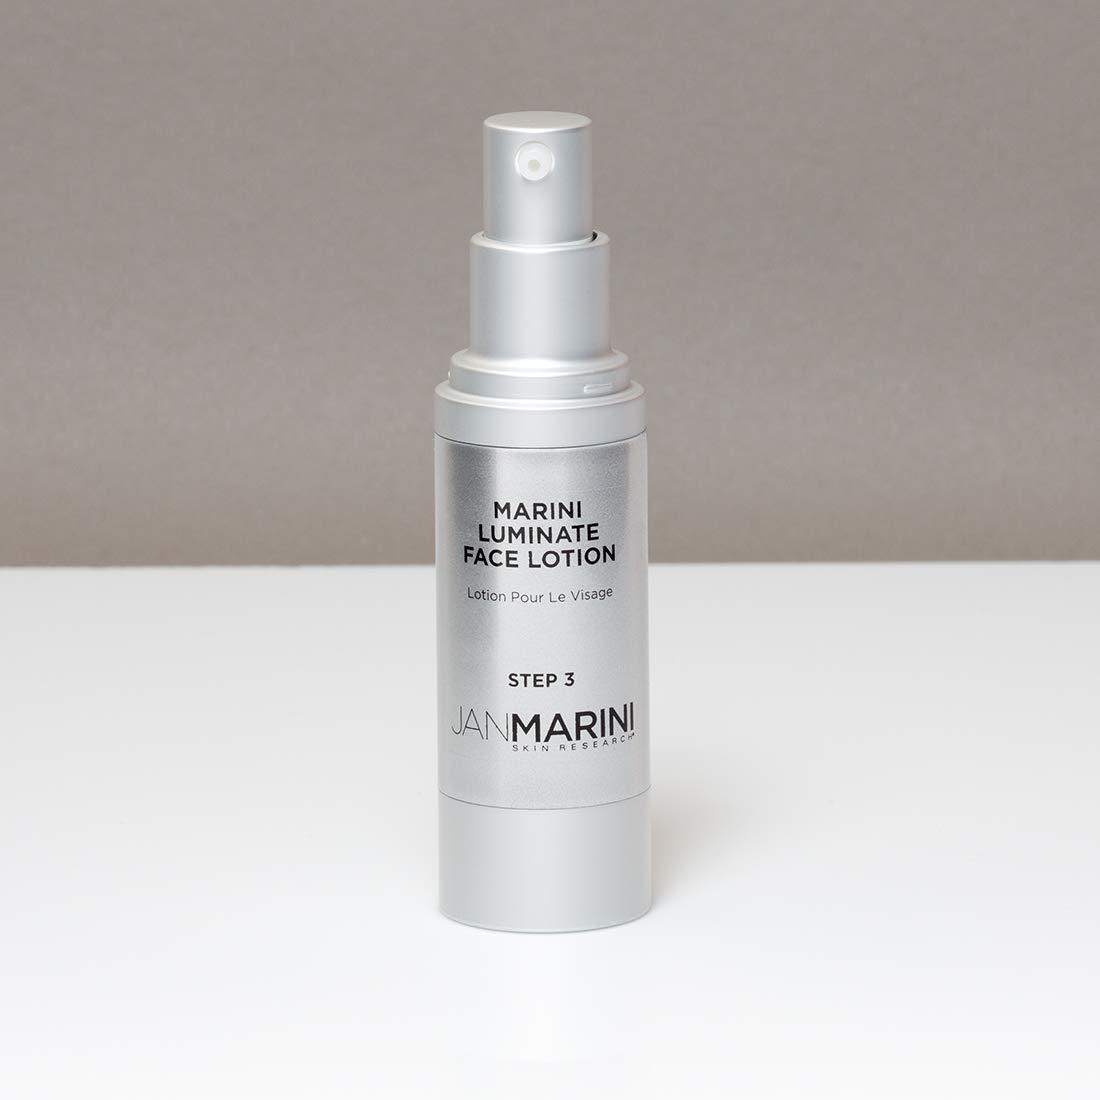 Jan Marini Skin Research Luminate Face Lotion, 1 fl. oz.